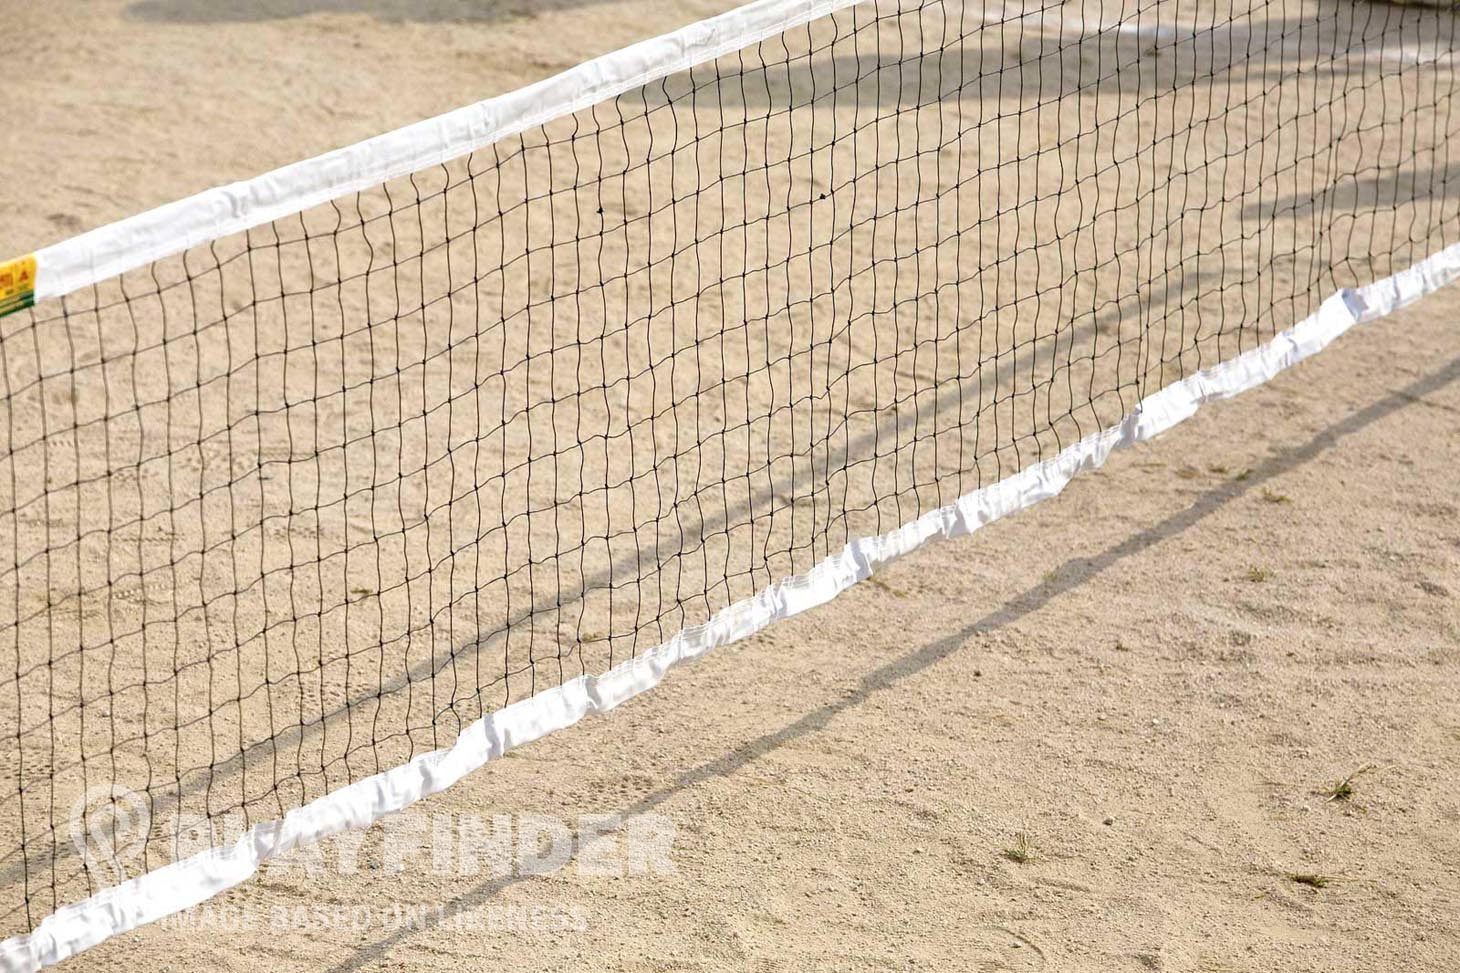 Abbey View Golf Course Court | Sand (beach) volleyball court